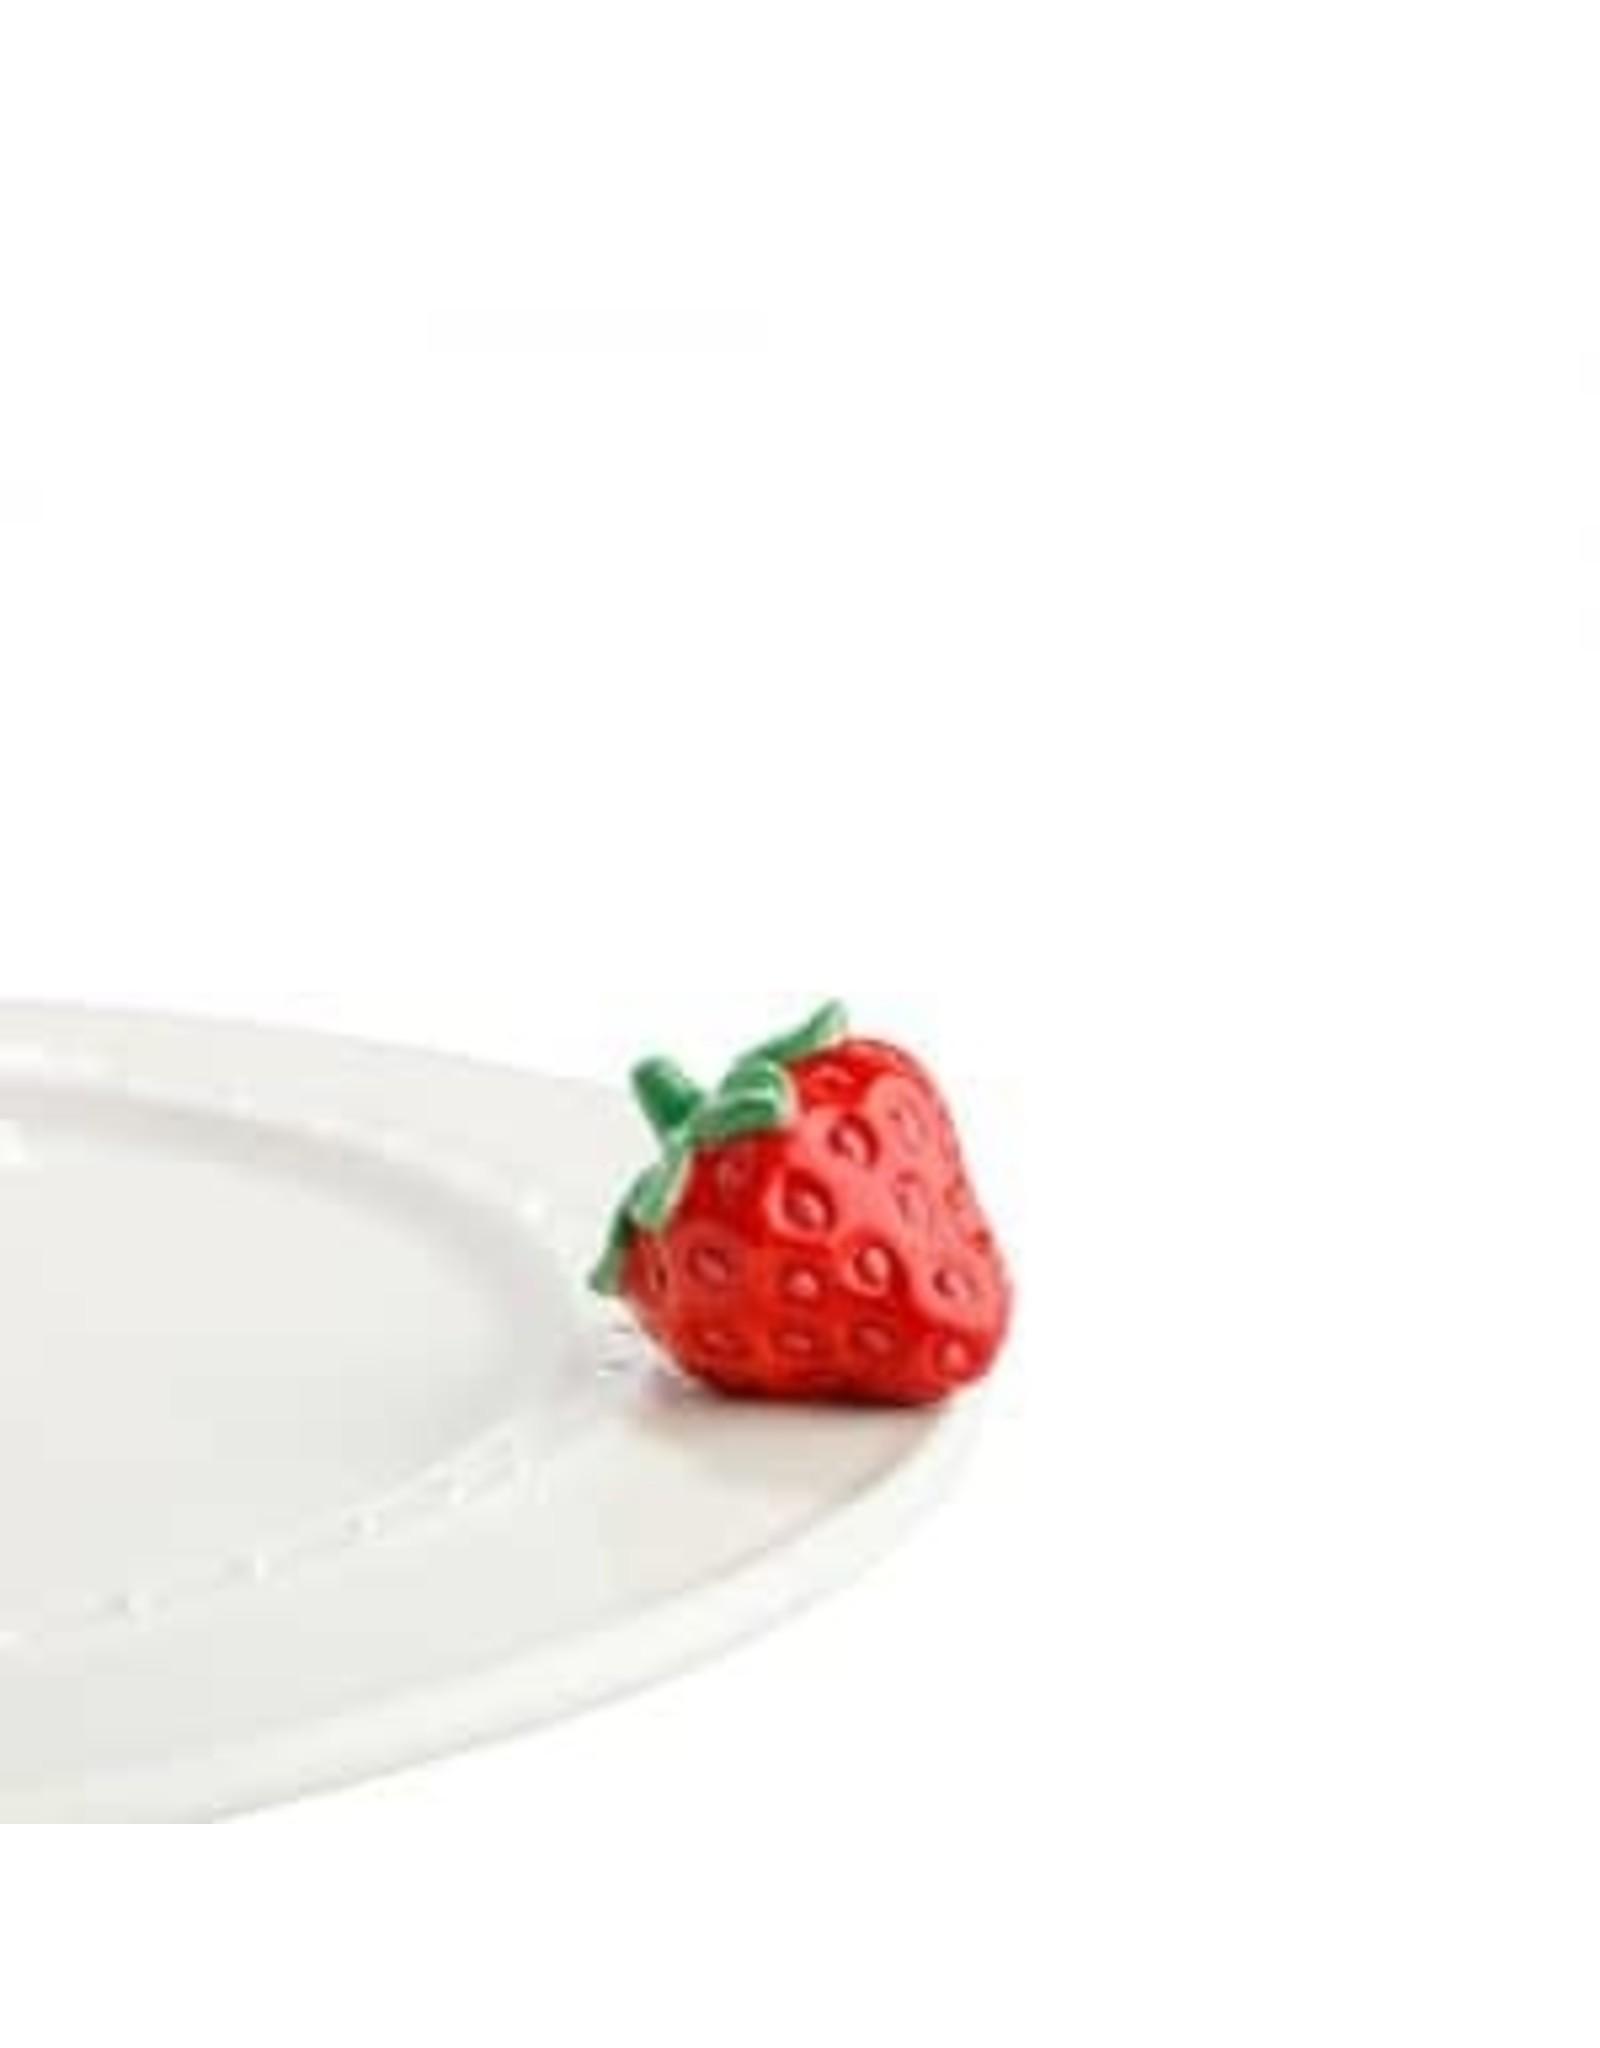 juicy fruit ( strawberry )